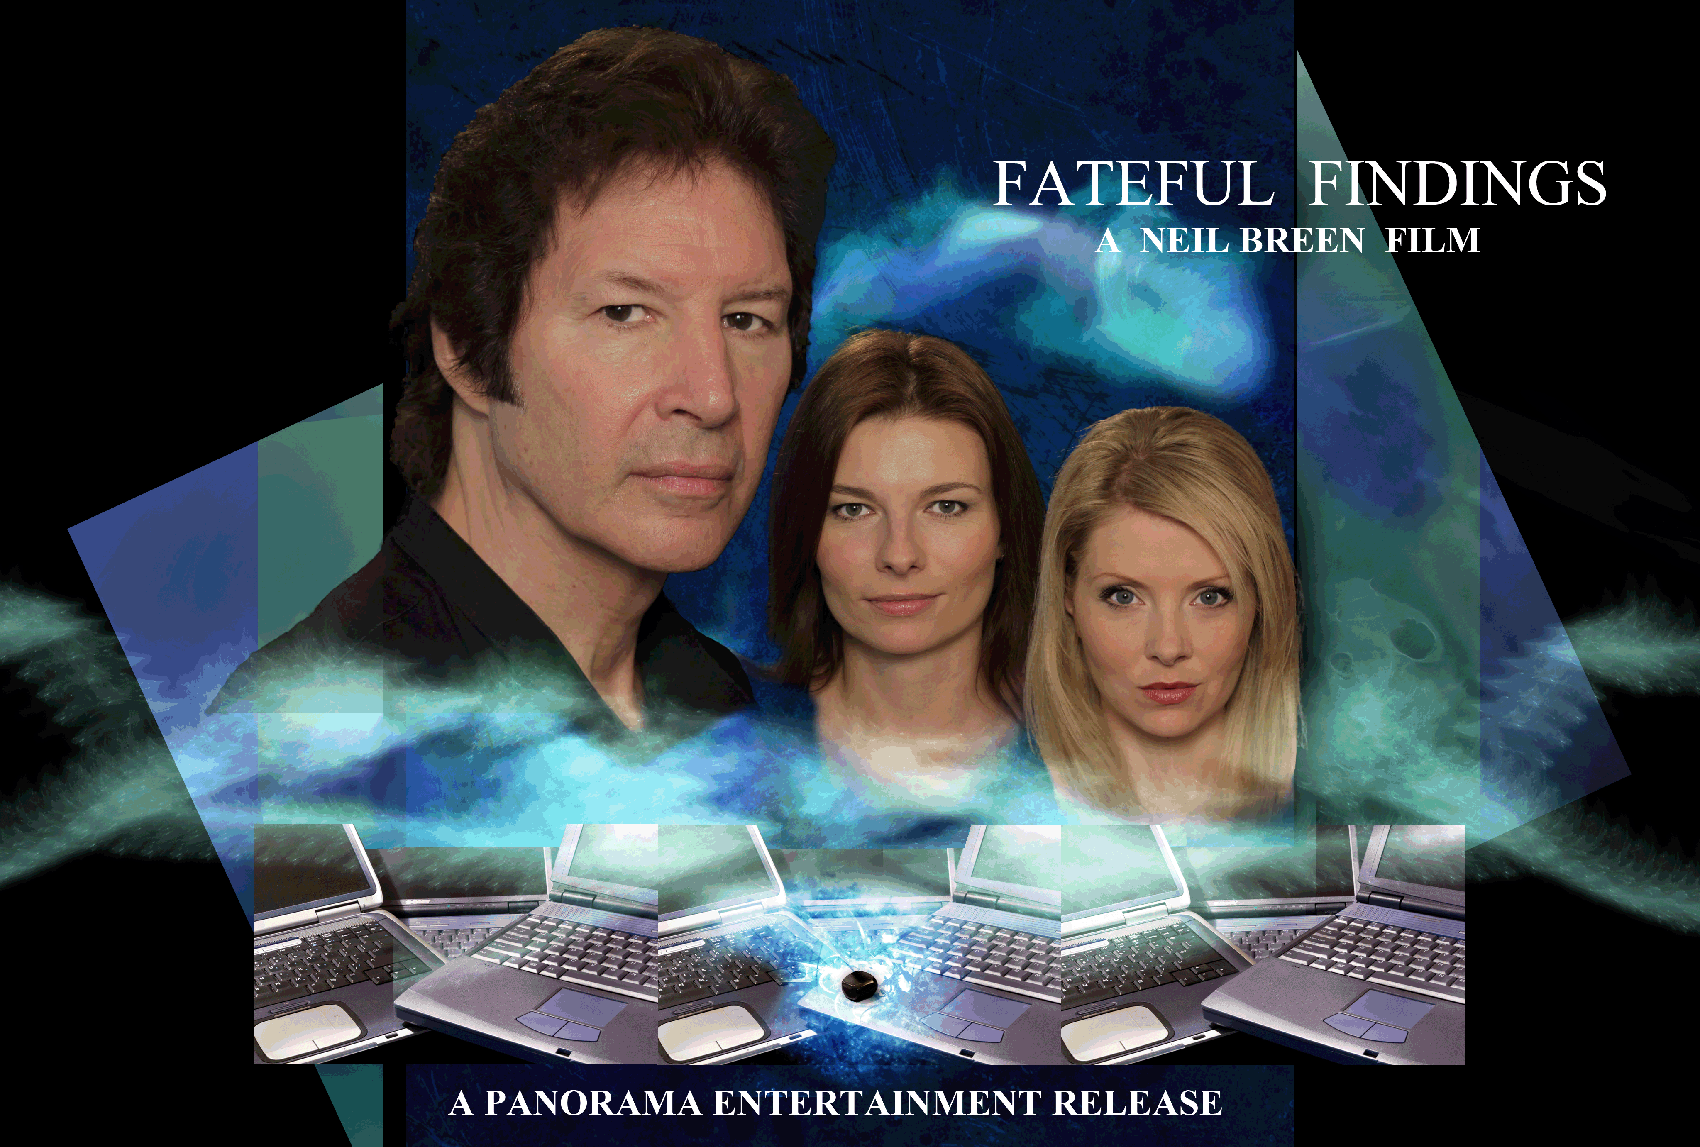 FatefulFindings_Poster_horizontal